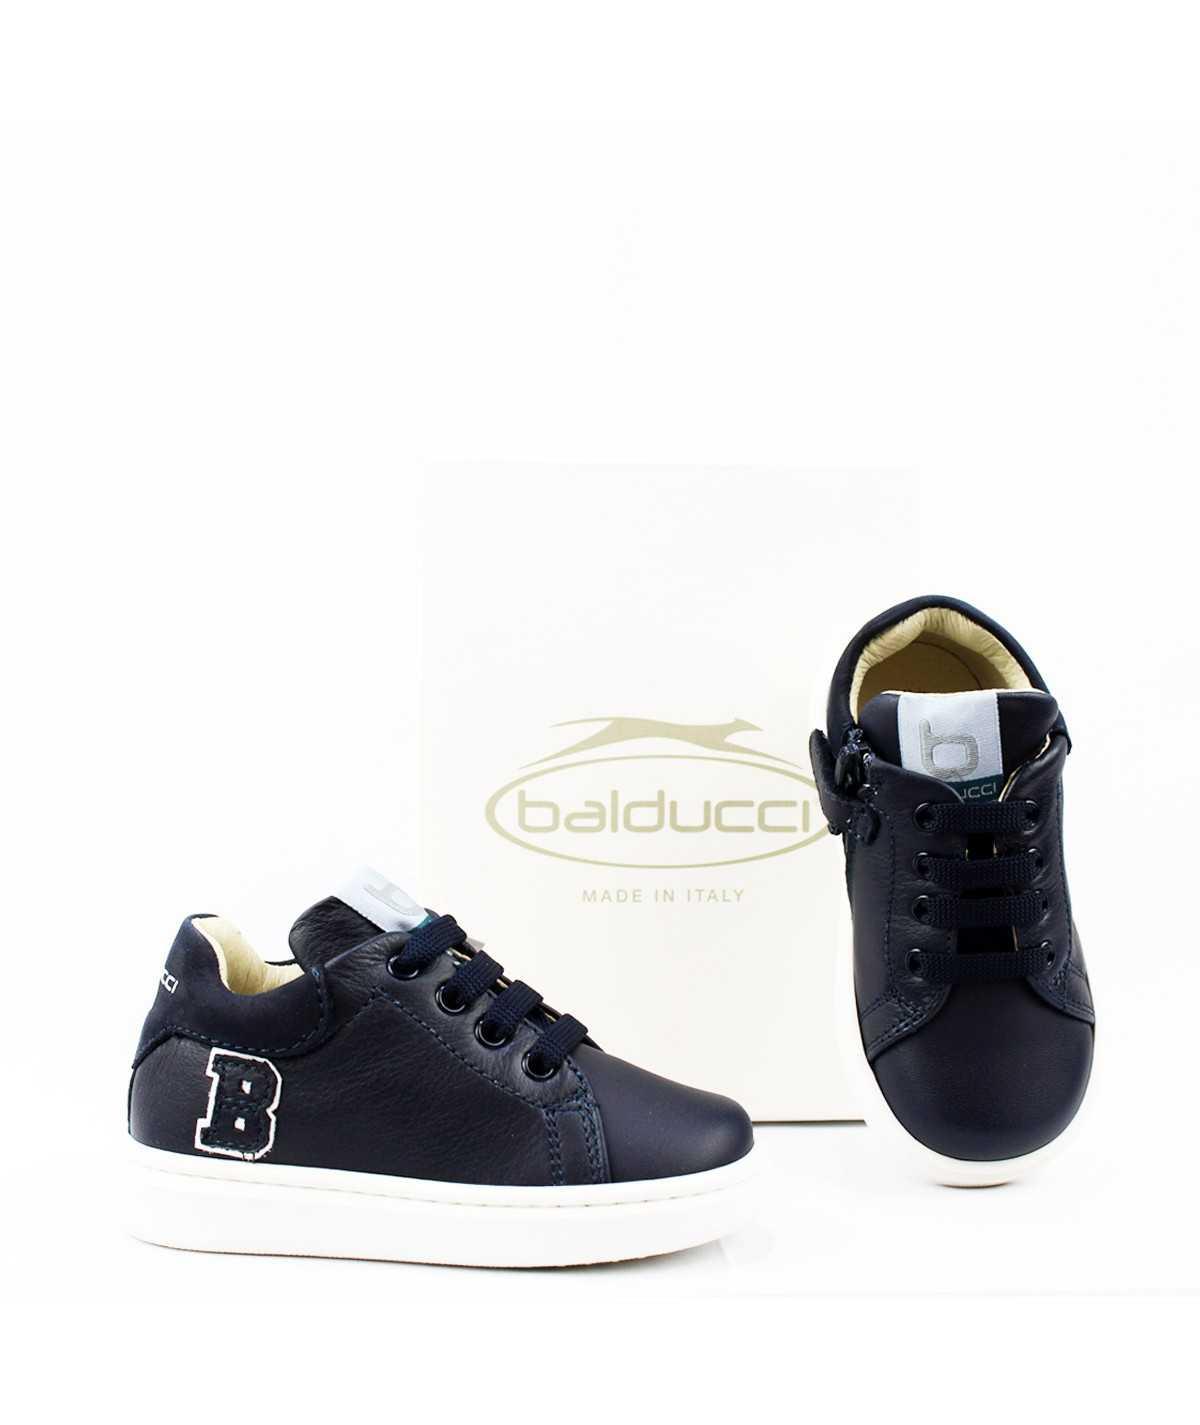 BALDUCCI Sneakers 19/26